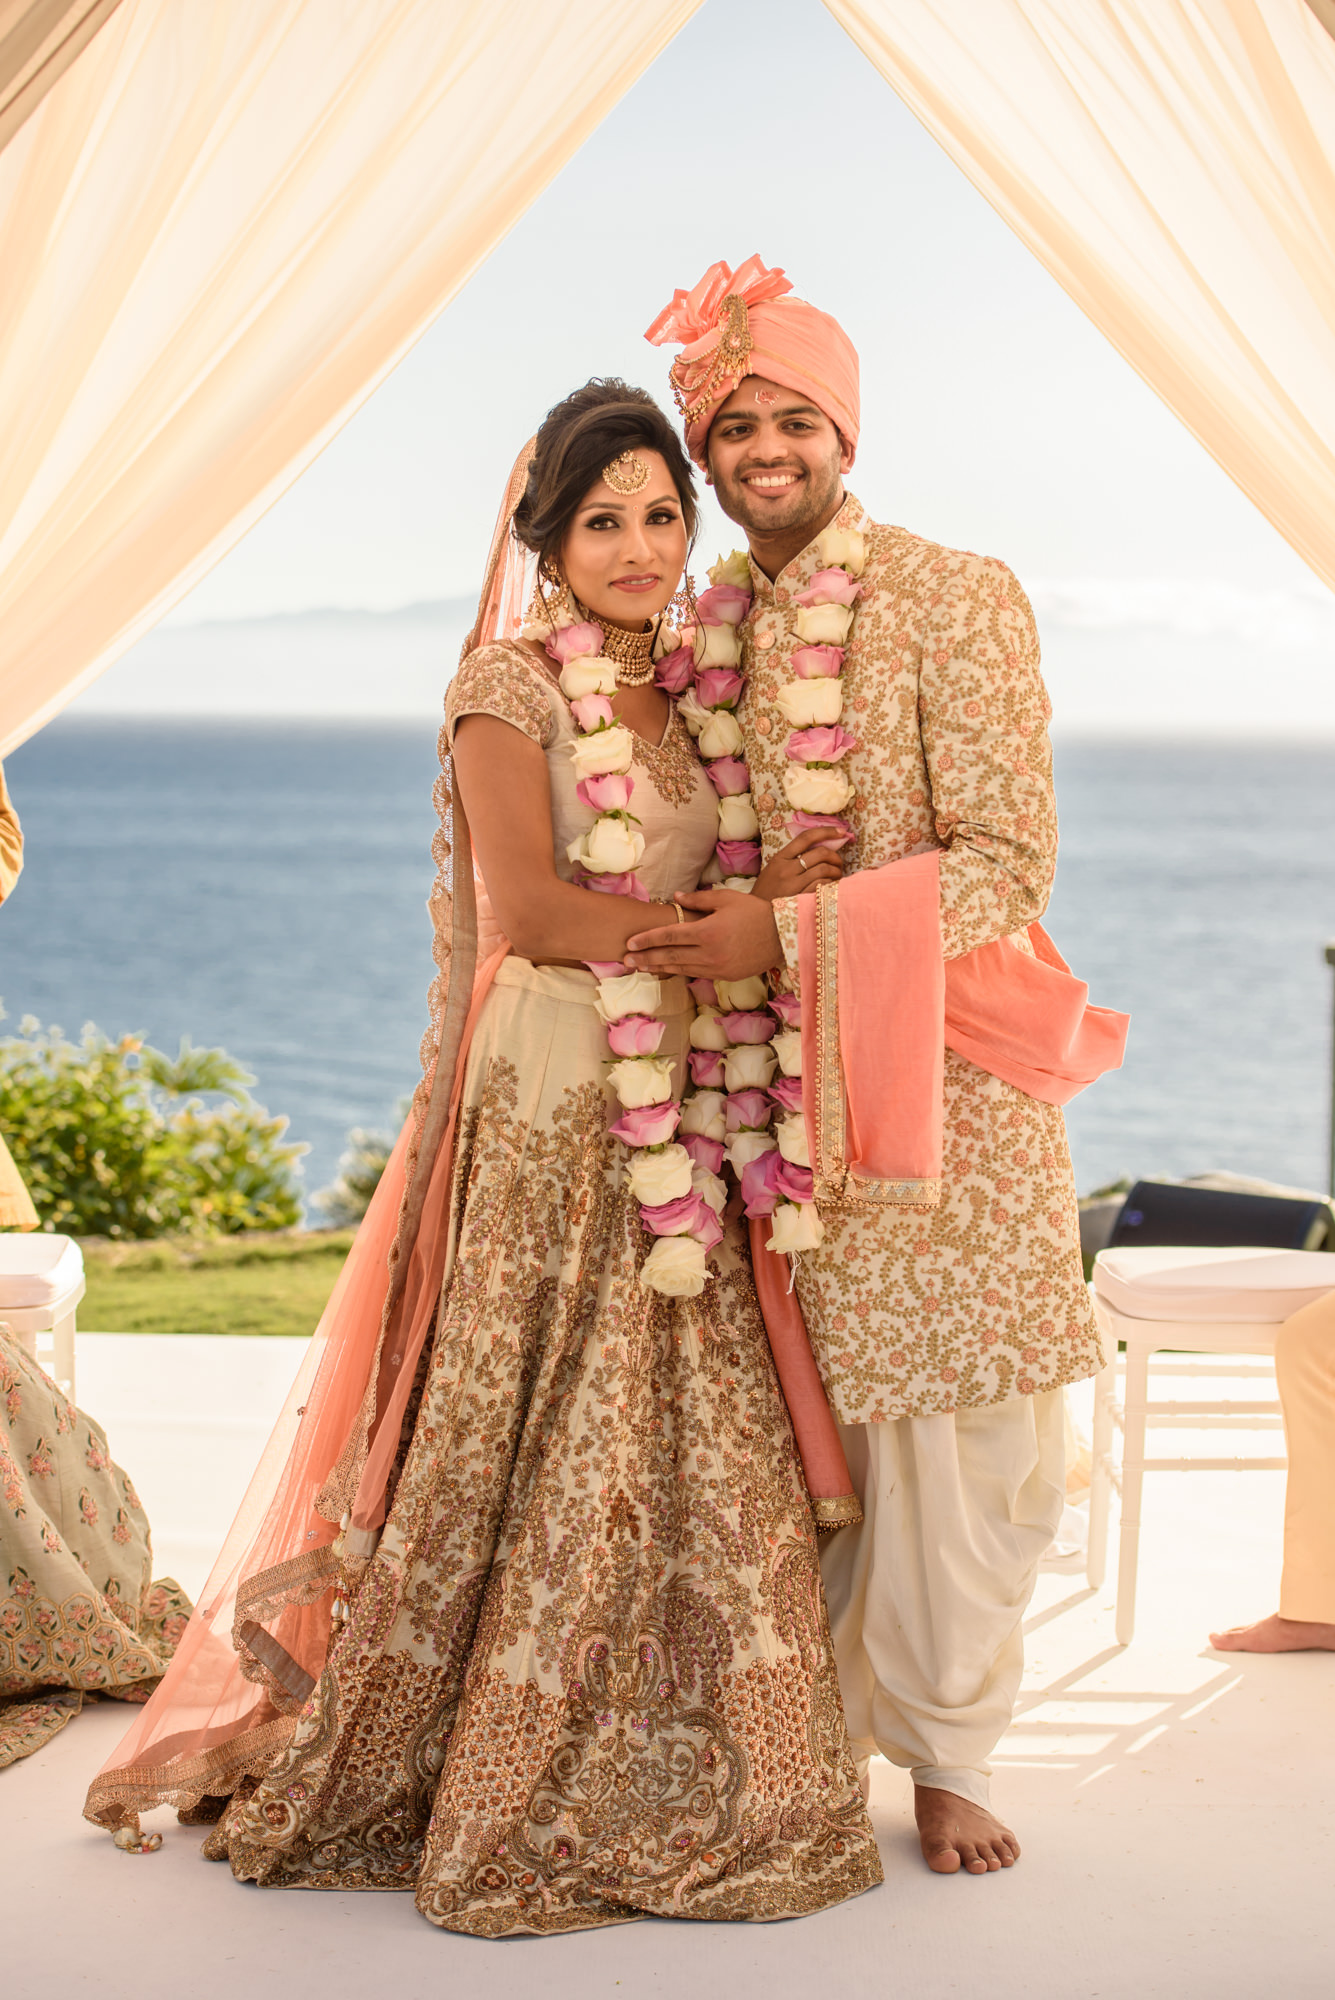 satnam photography wedding indian asian hindu destination wedding photographer tenerife ritz carlton abama-150.jpg